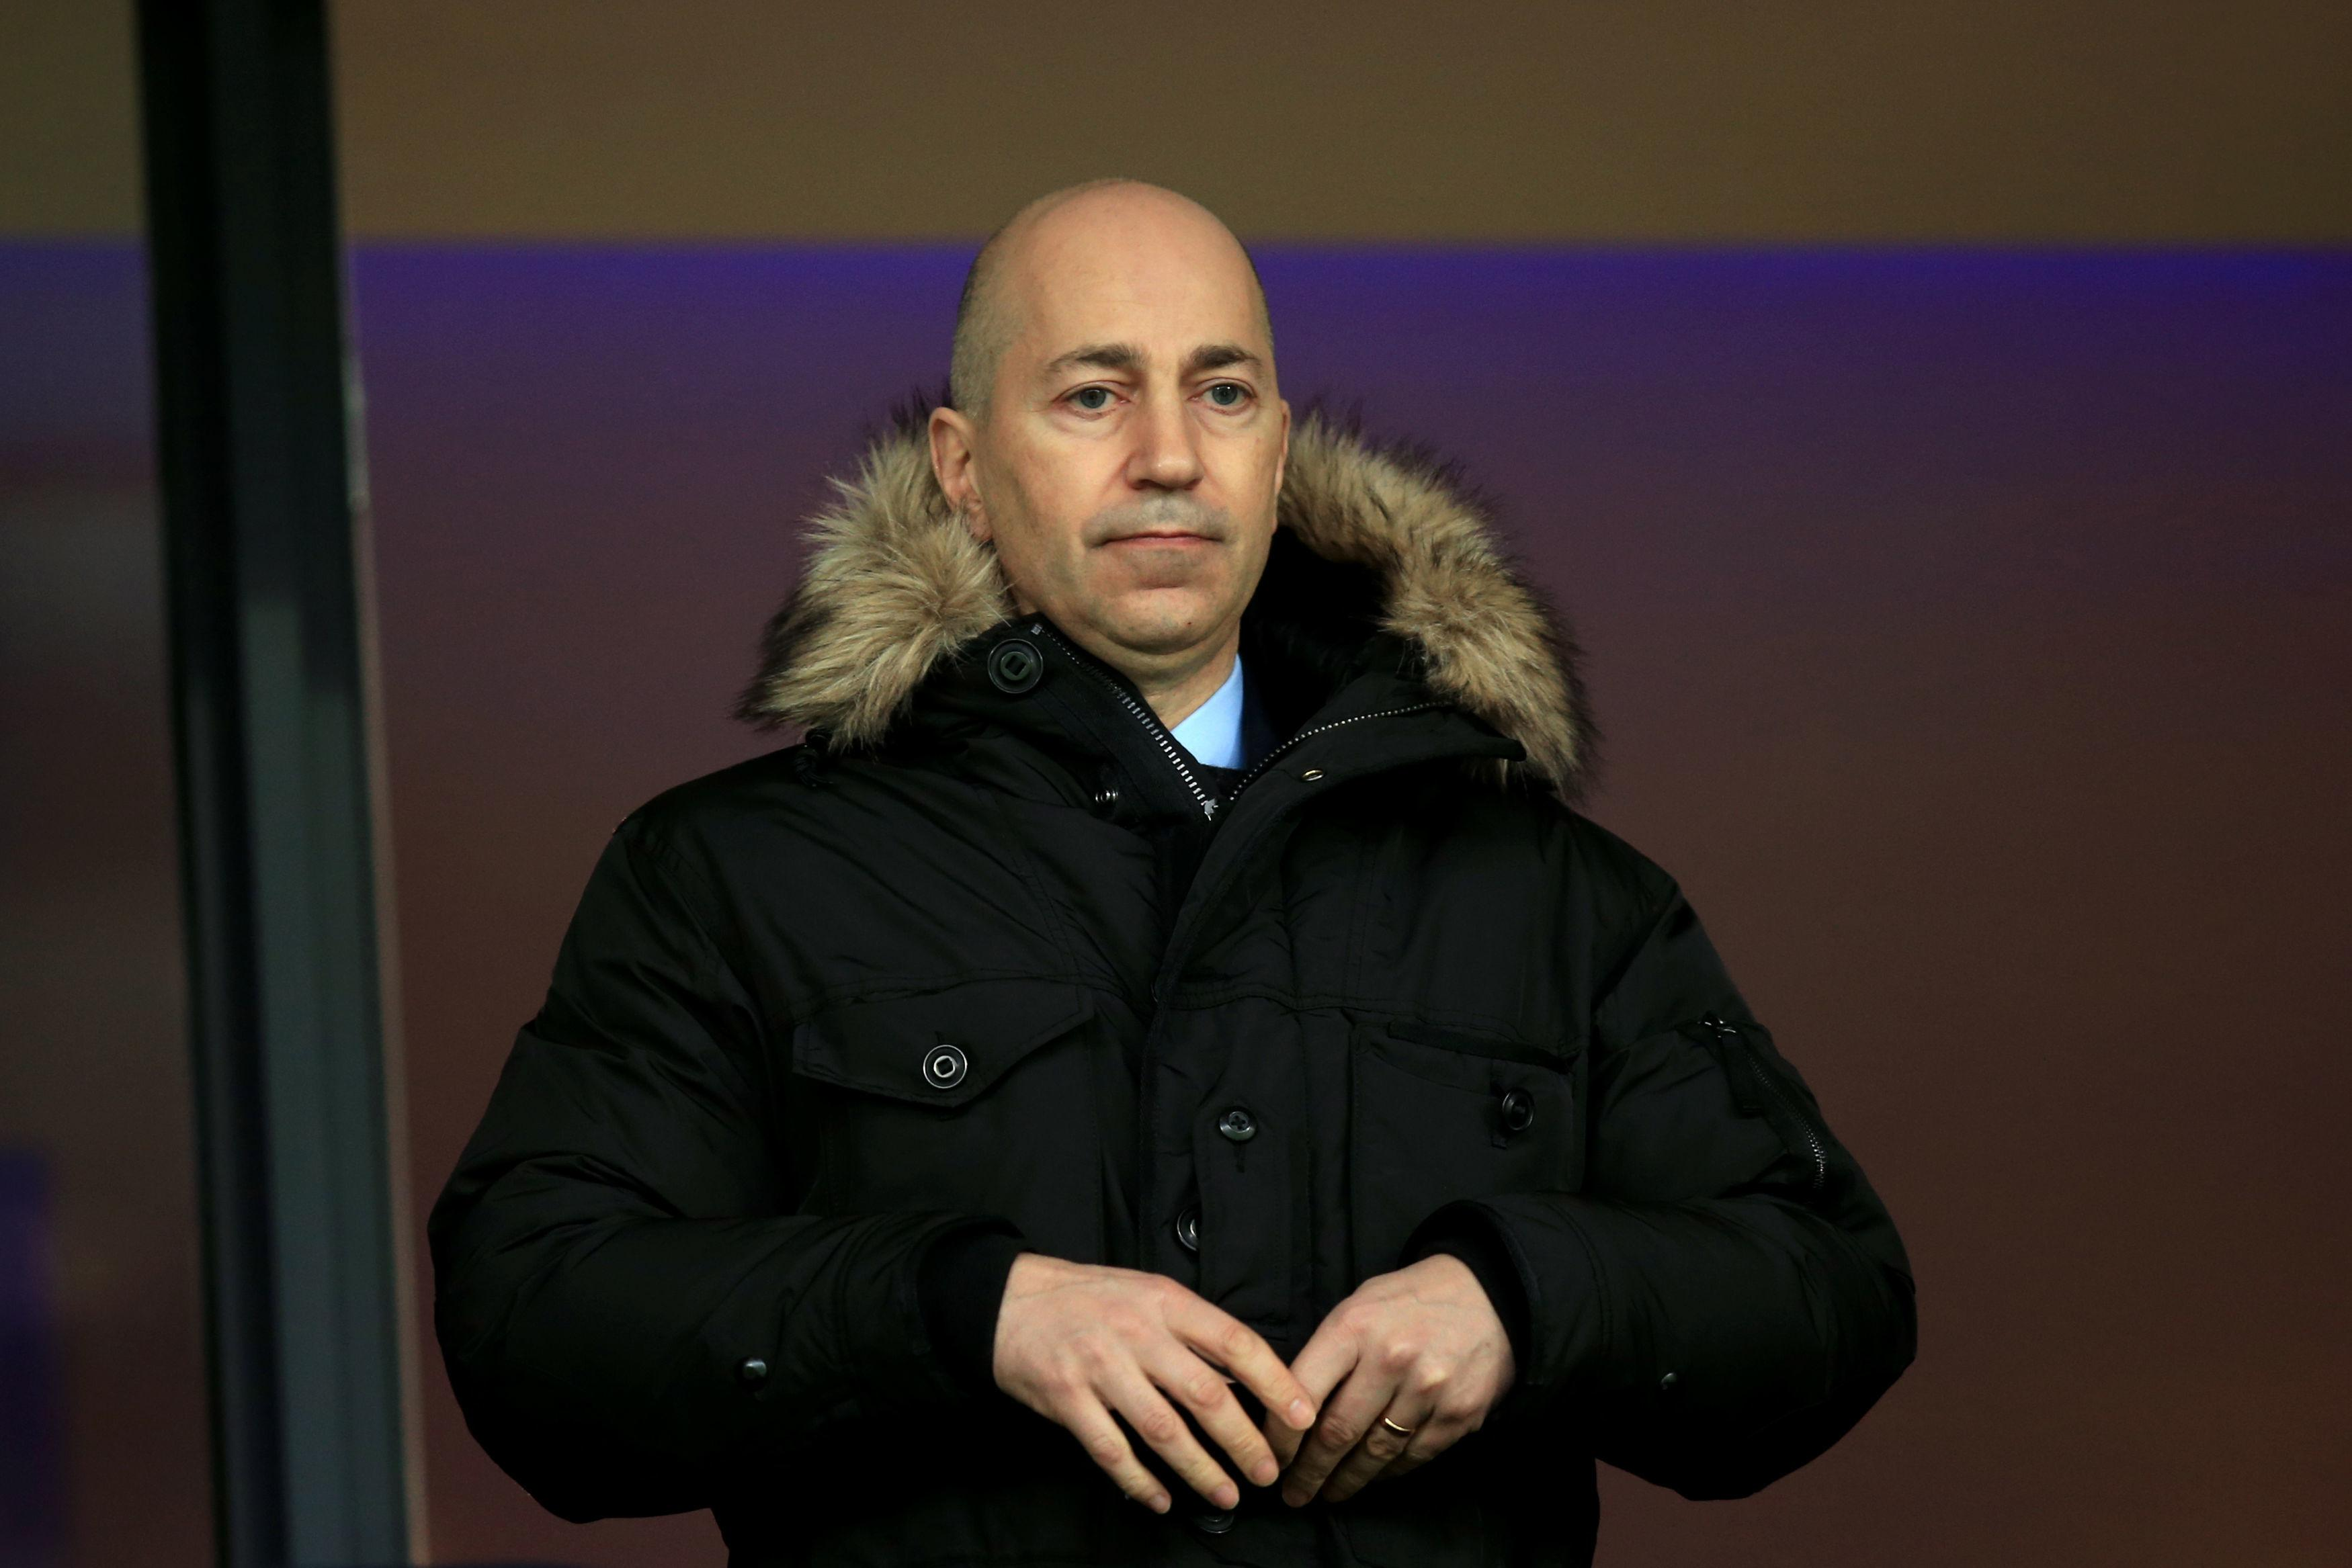 Ivan Gazidis' future is uncertain at Arsenal amid interest from AC Milan